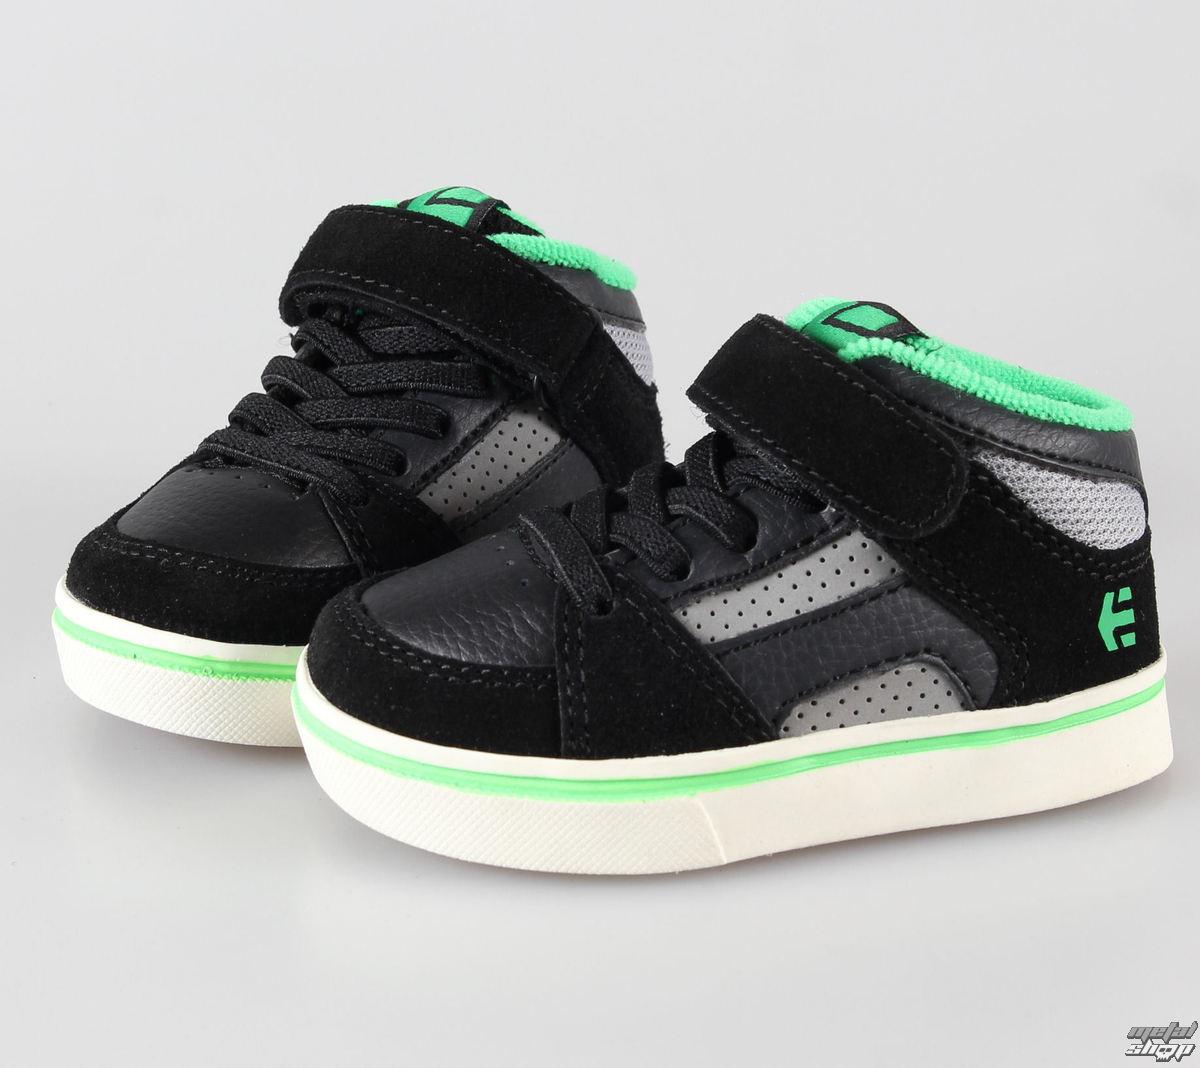 boty dětské ETNIES - Toddler RVM Strap - Black/Green